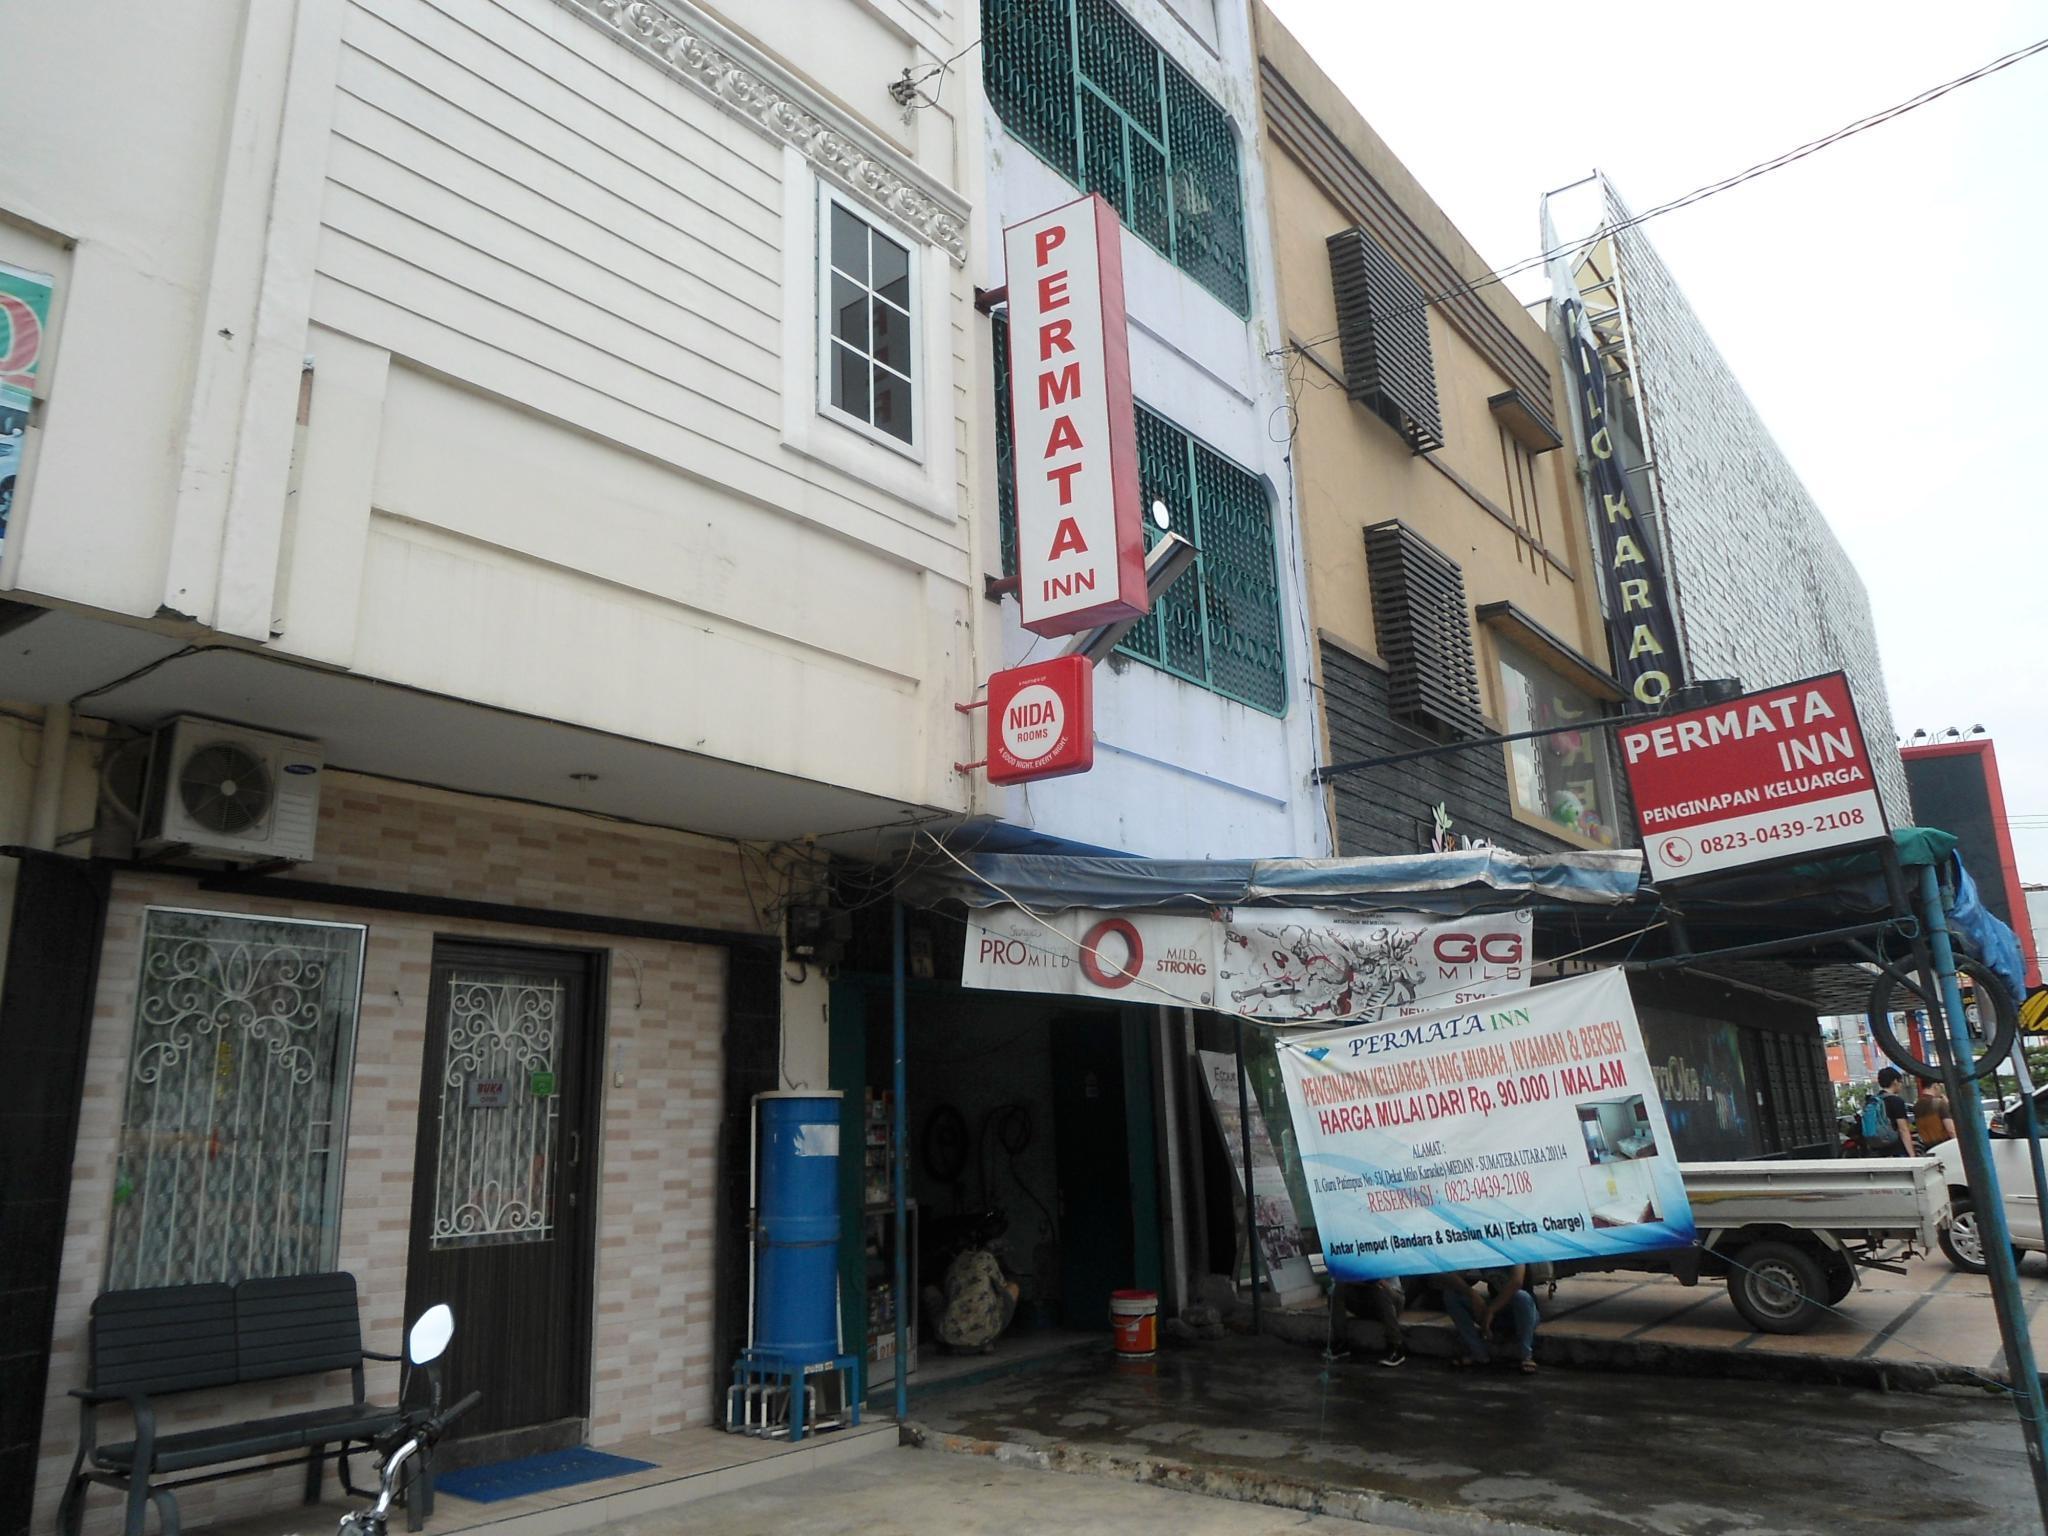 Surface Standard Salle De Bain permata inn, centre-ville de medan, (medan, indonésie